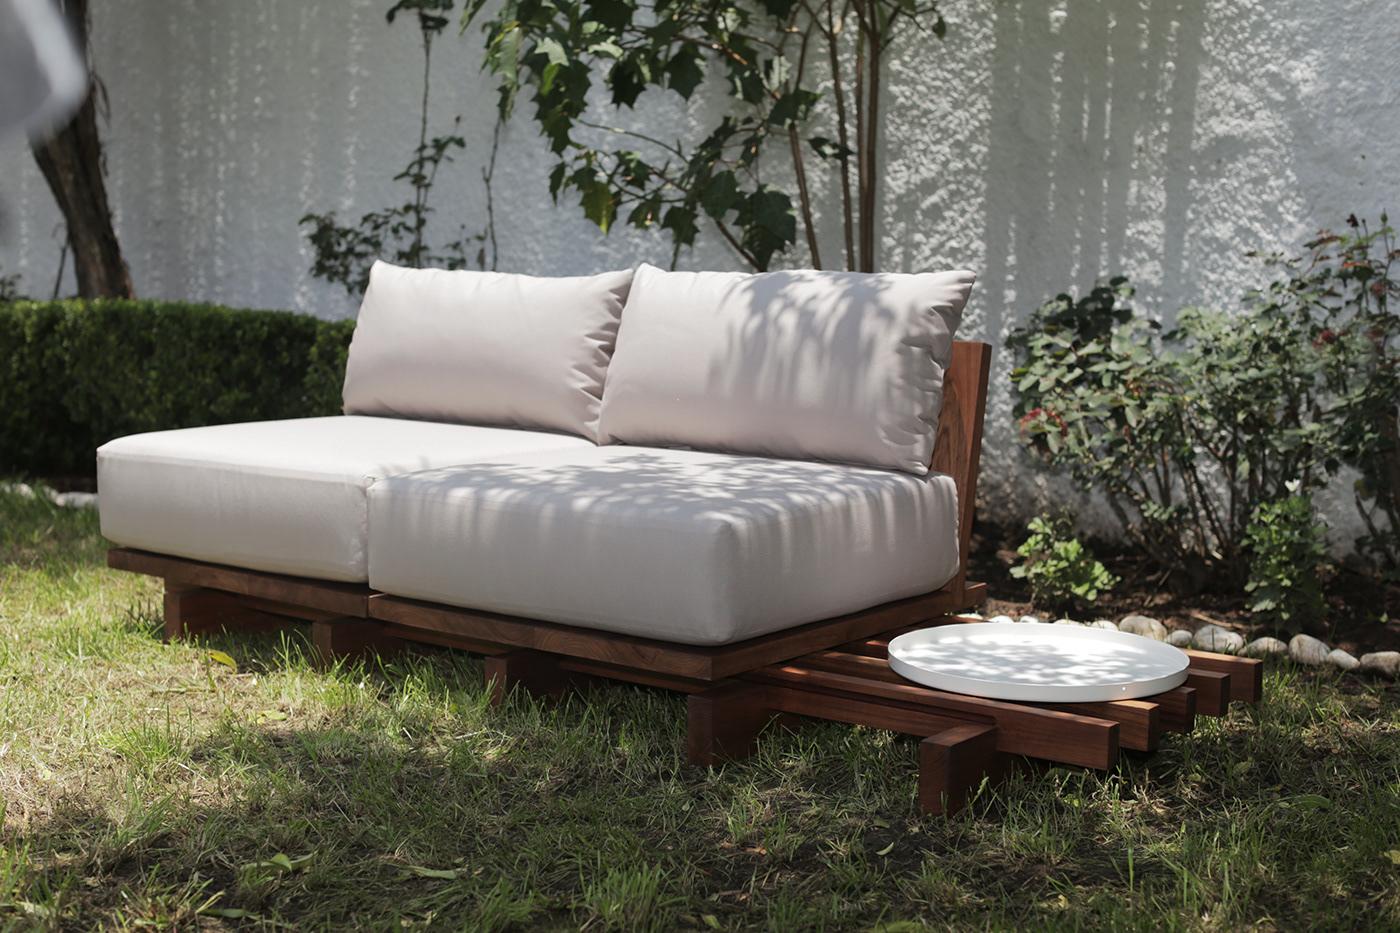 COVid furniture Garden Furniture industrial design  mexico monterrey outdoor furniture pool furniture